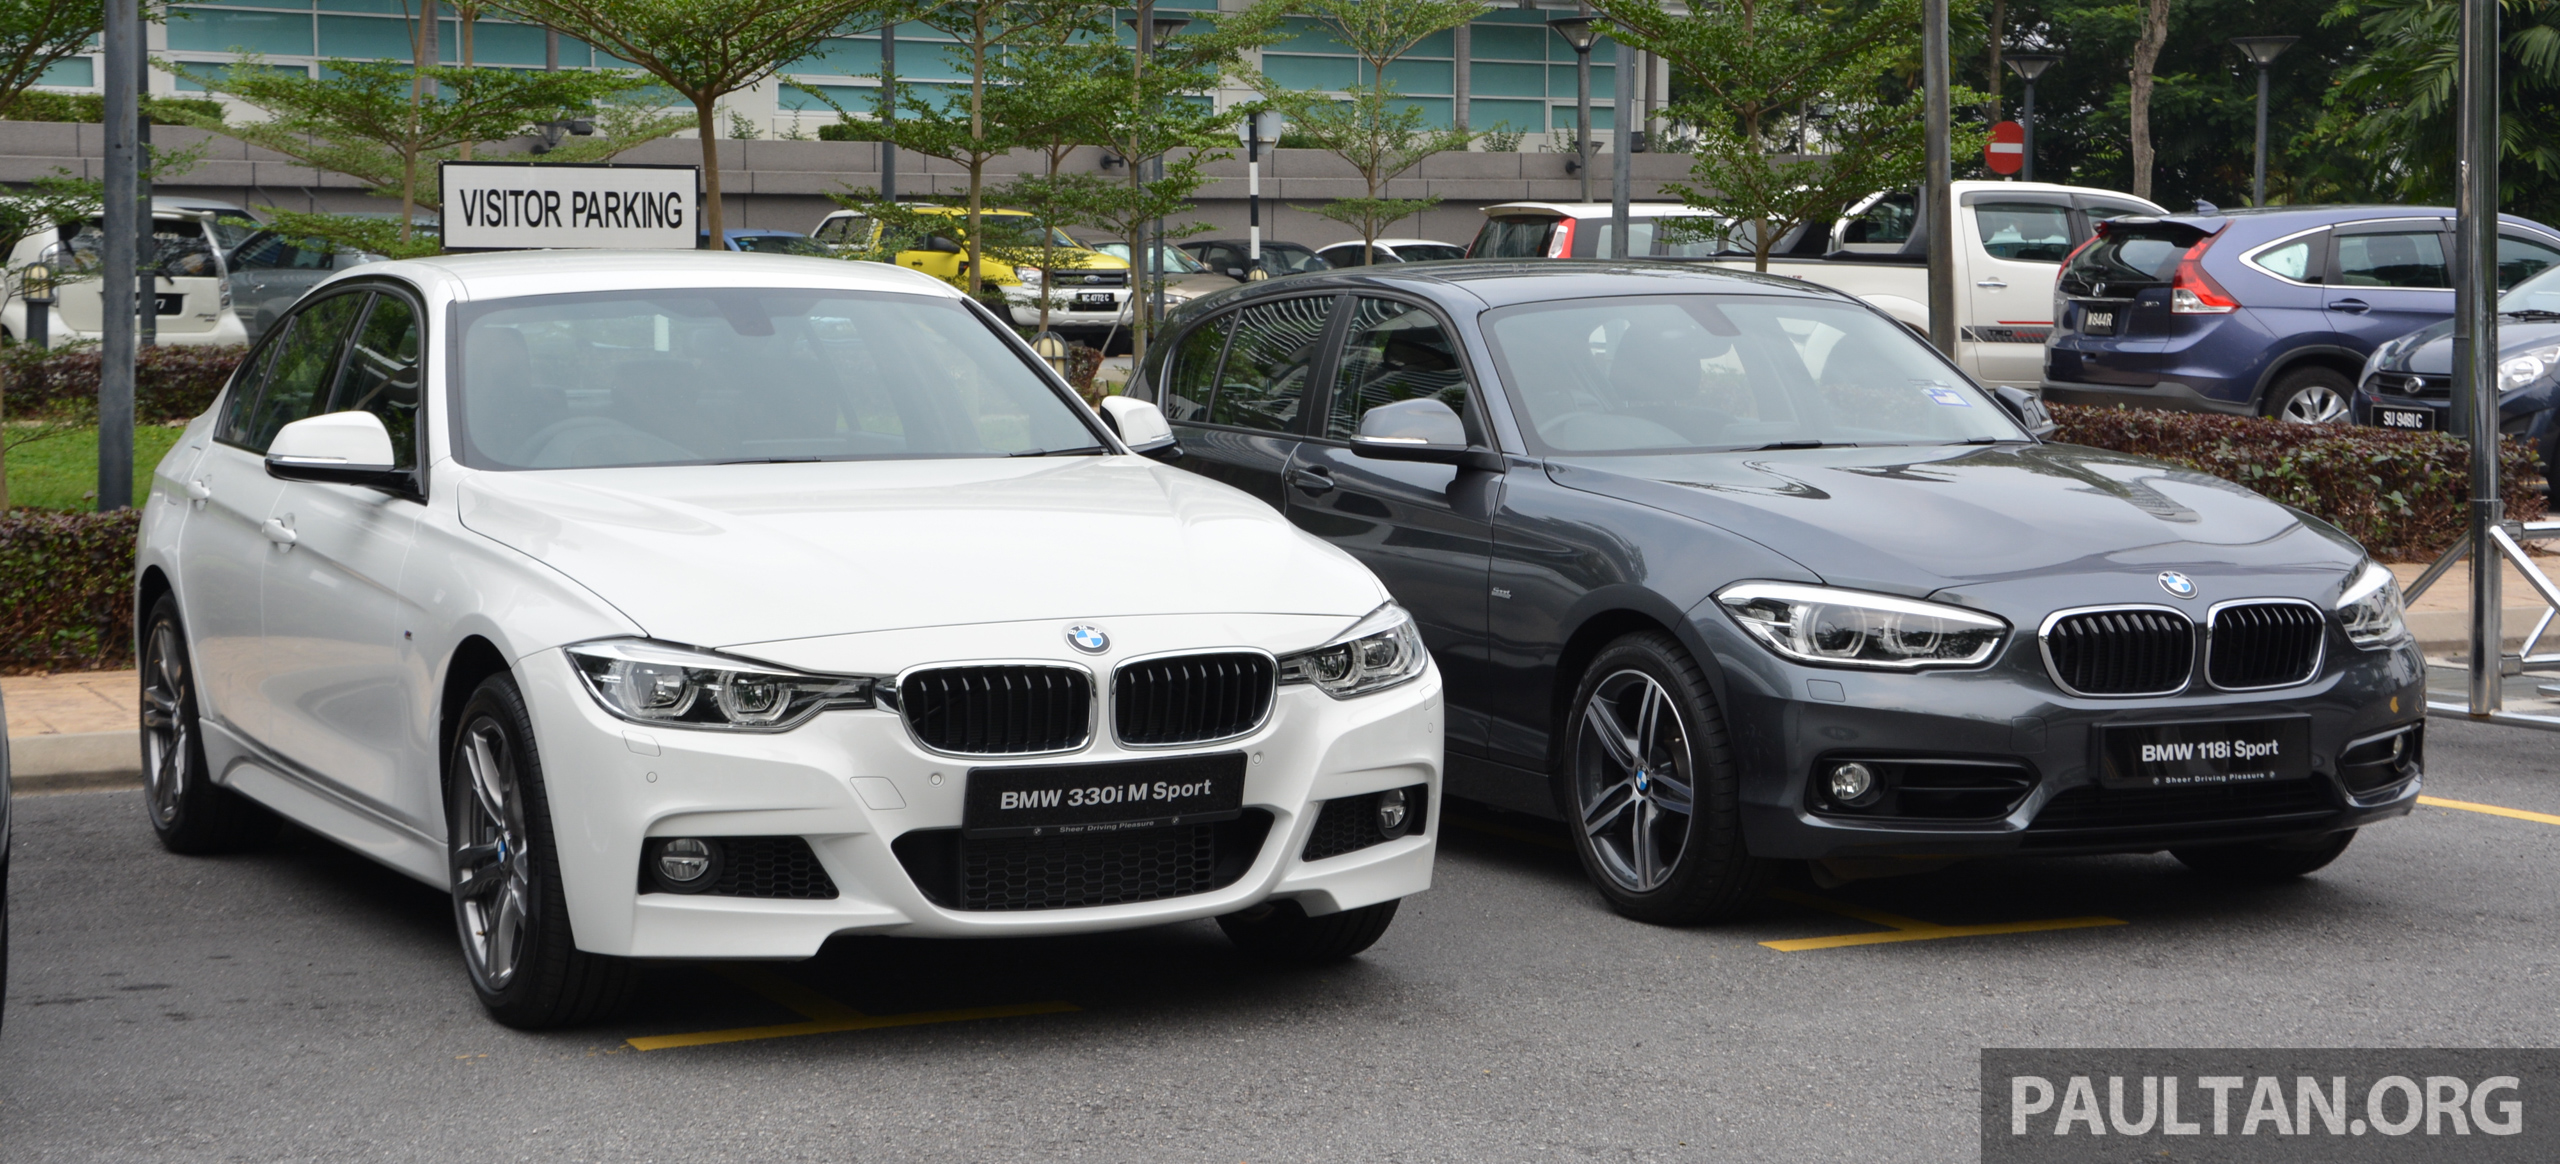 BMW 5 Series, X3 and 3 Series Gran Turismo get EEV status ...